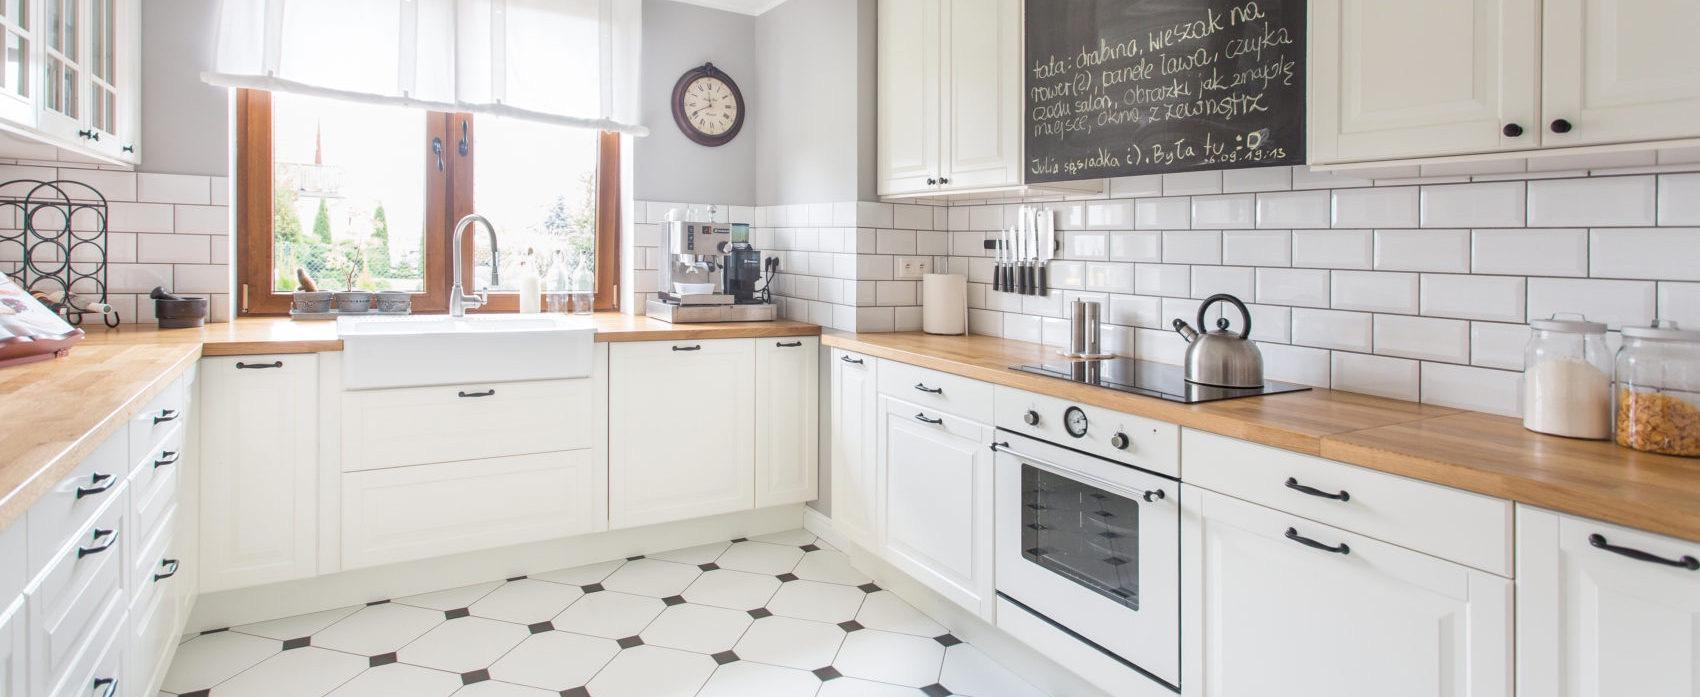 Projektowanie kuchni i mebli kuchennych